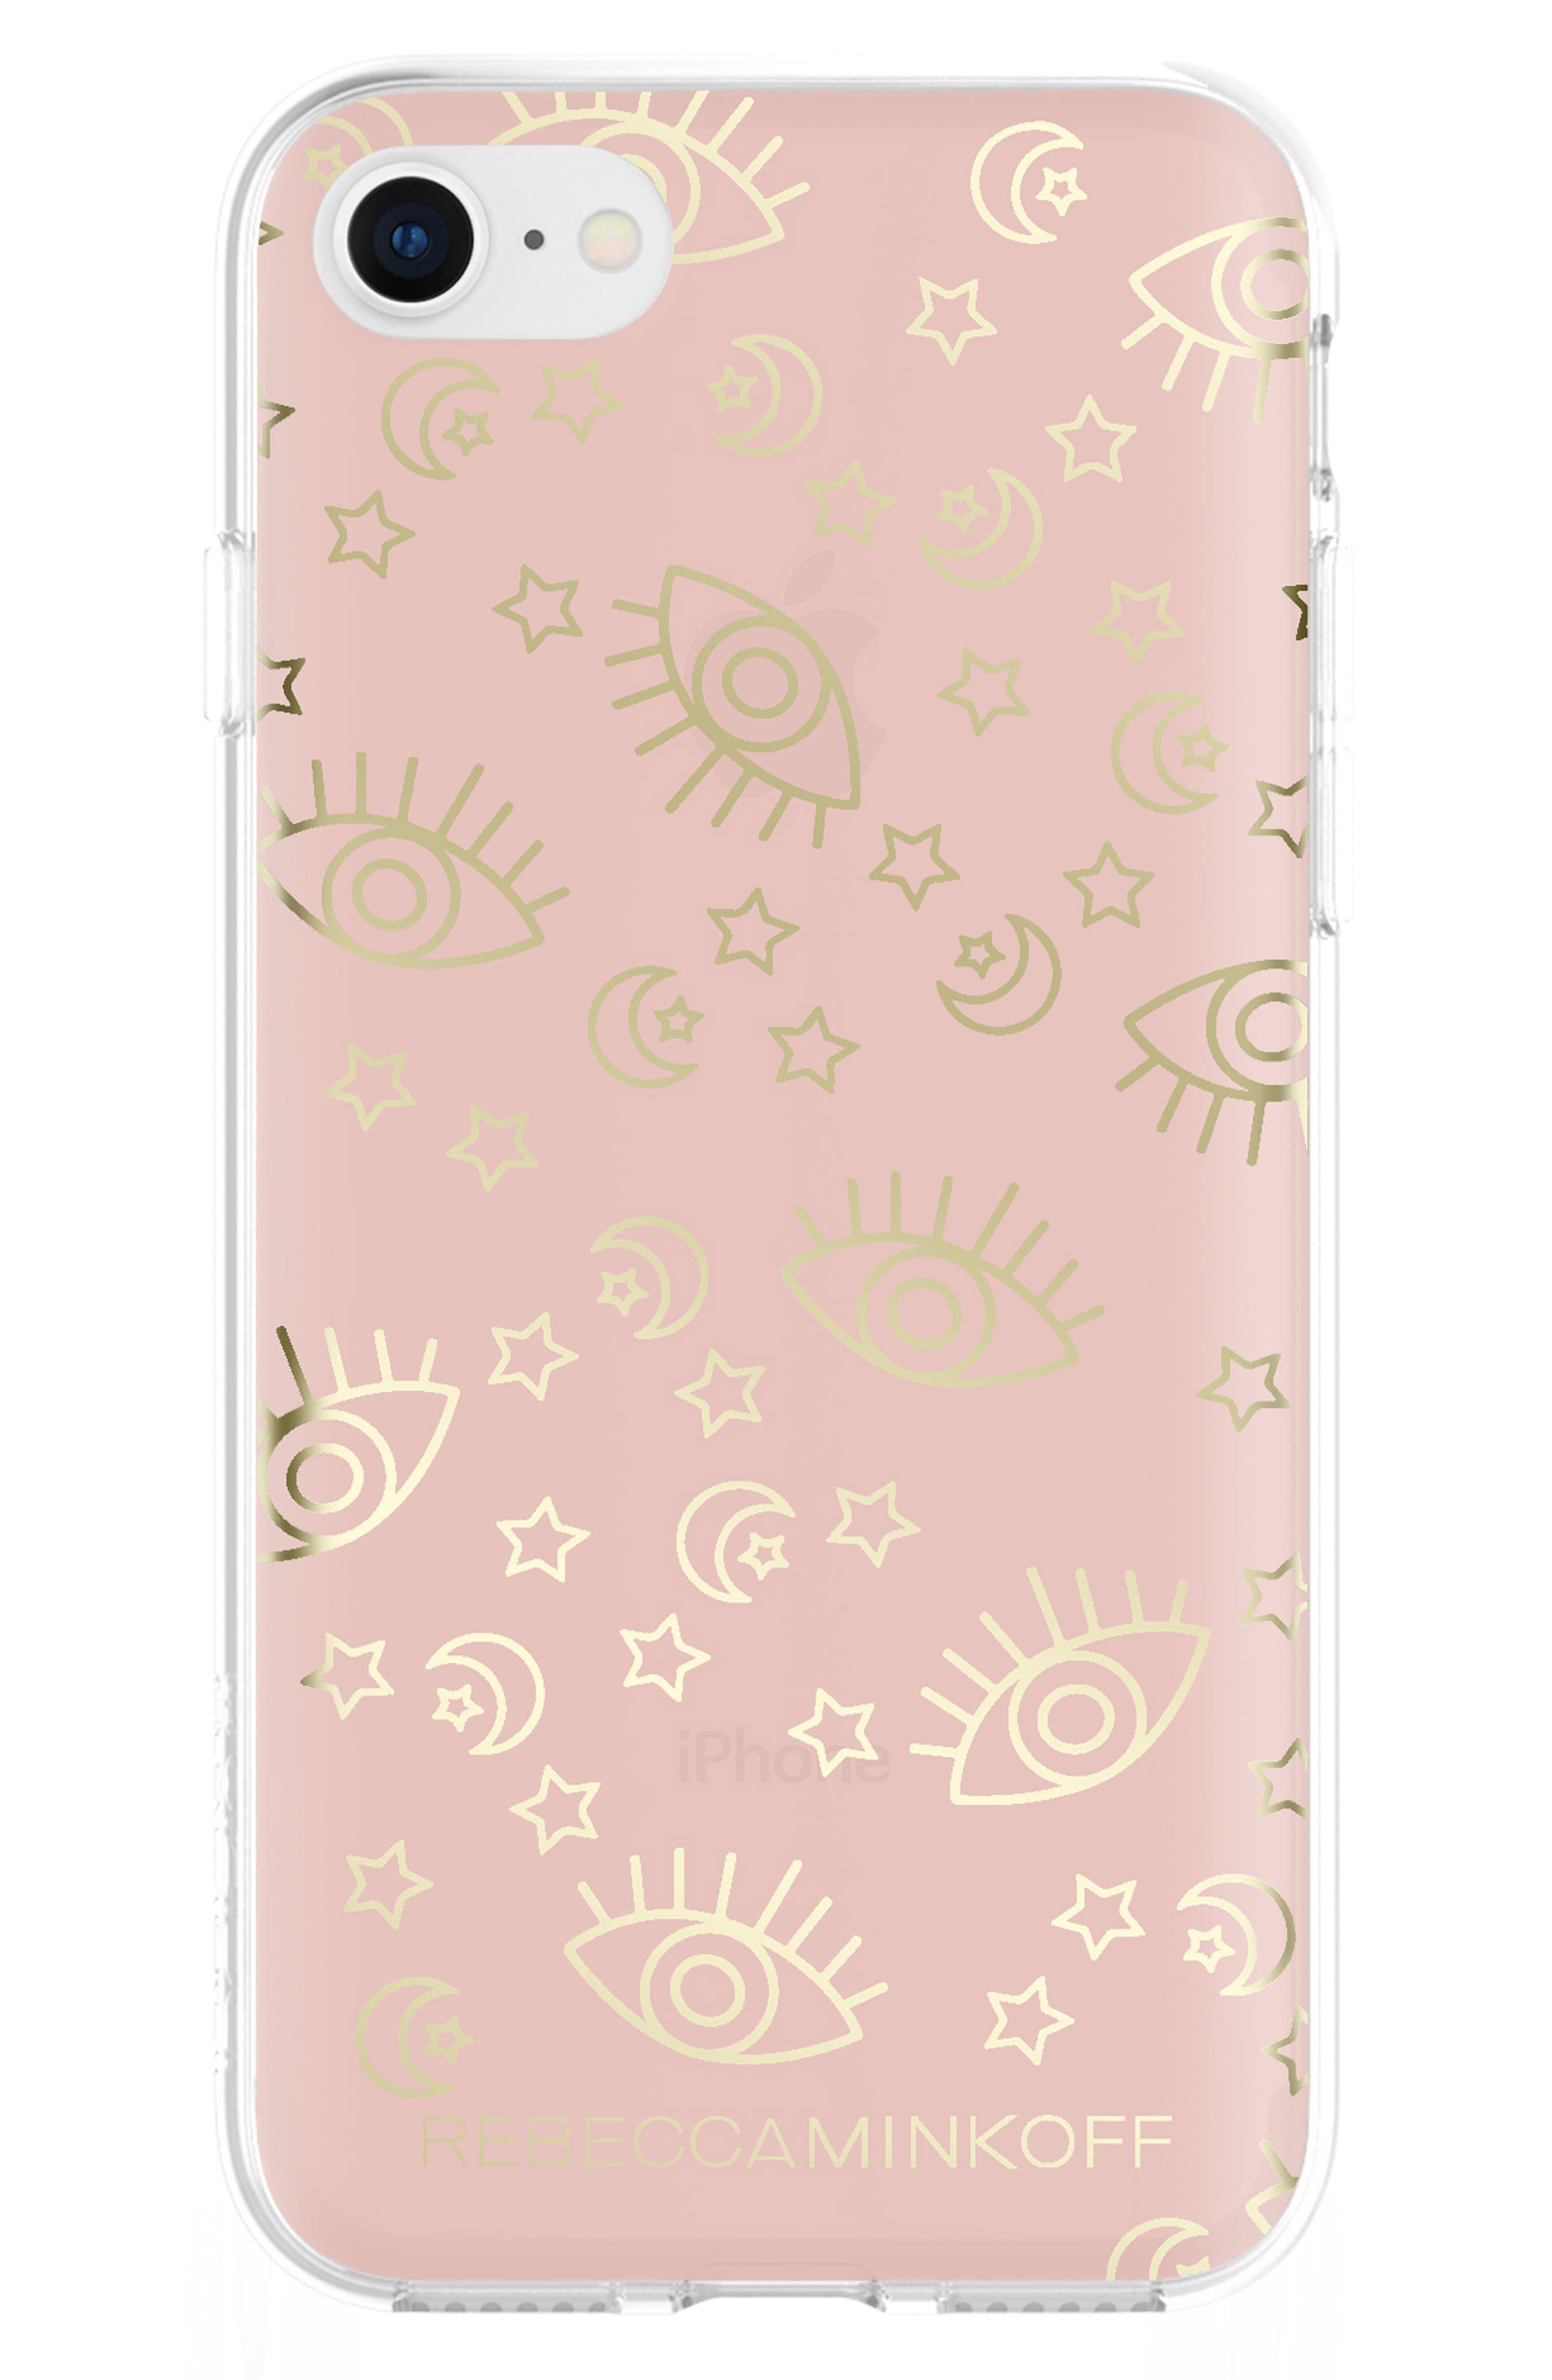 Metallic Galaxy Icon iPhone 7/8 & 7/8 Plus Case,                             Main thumbnail 1, color,                             Rose Gold/ Gold Foil